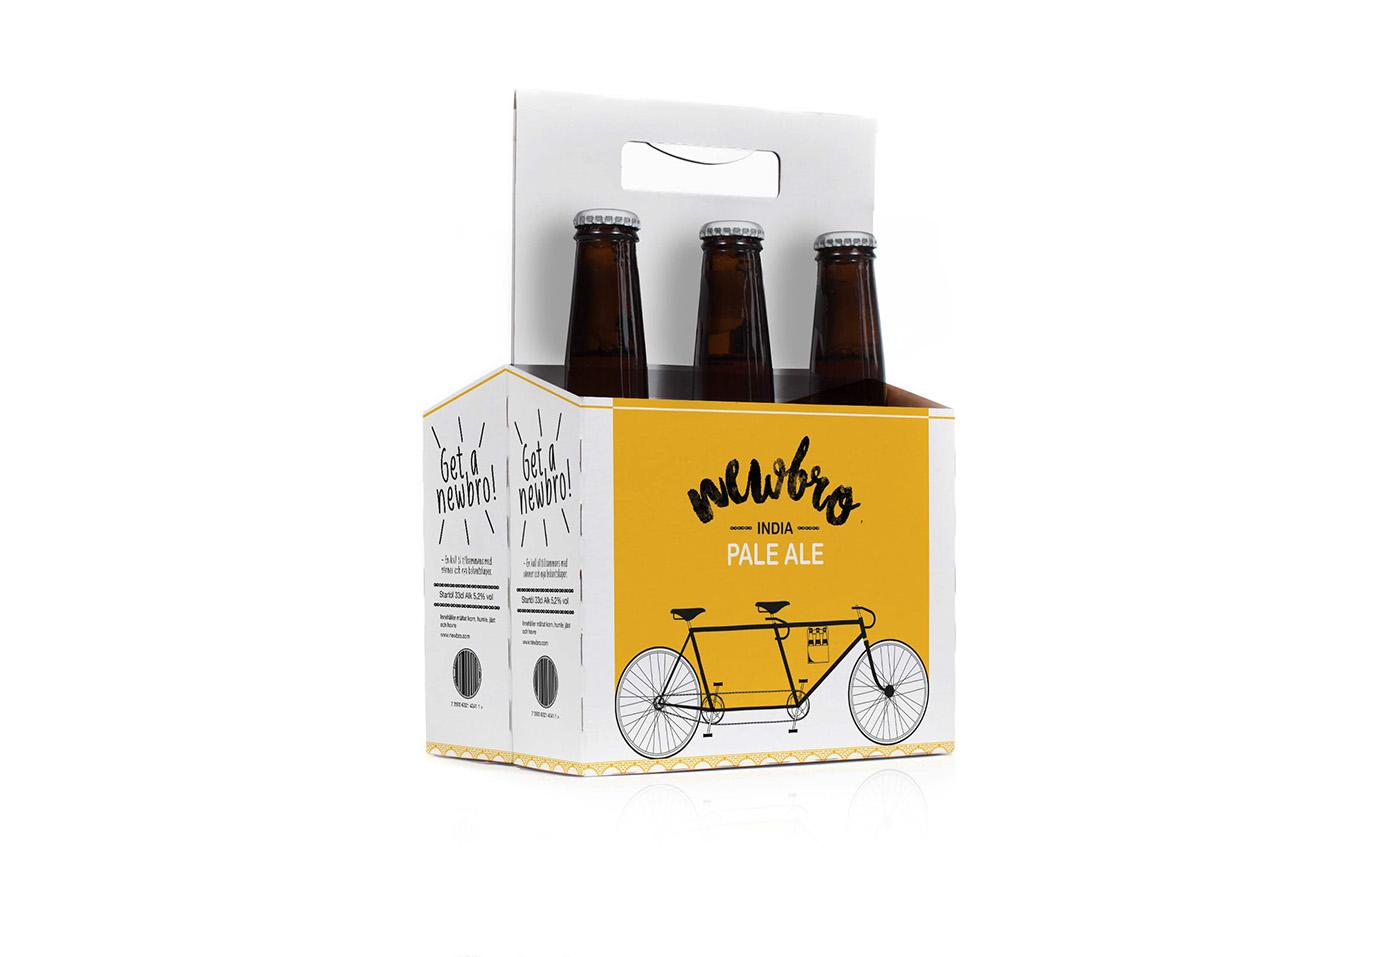 marketing   branding  brewery packeting graphic design  Bicycle beer